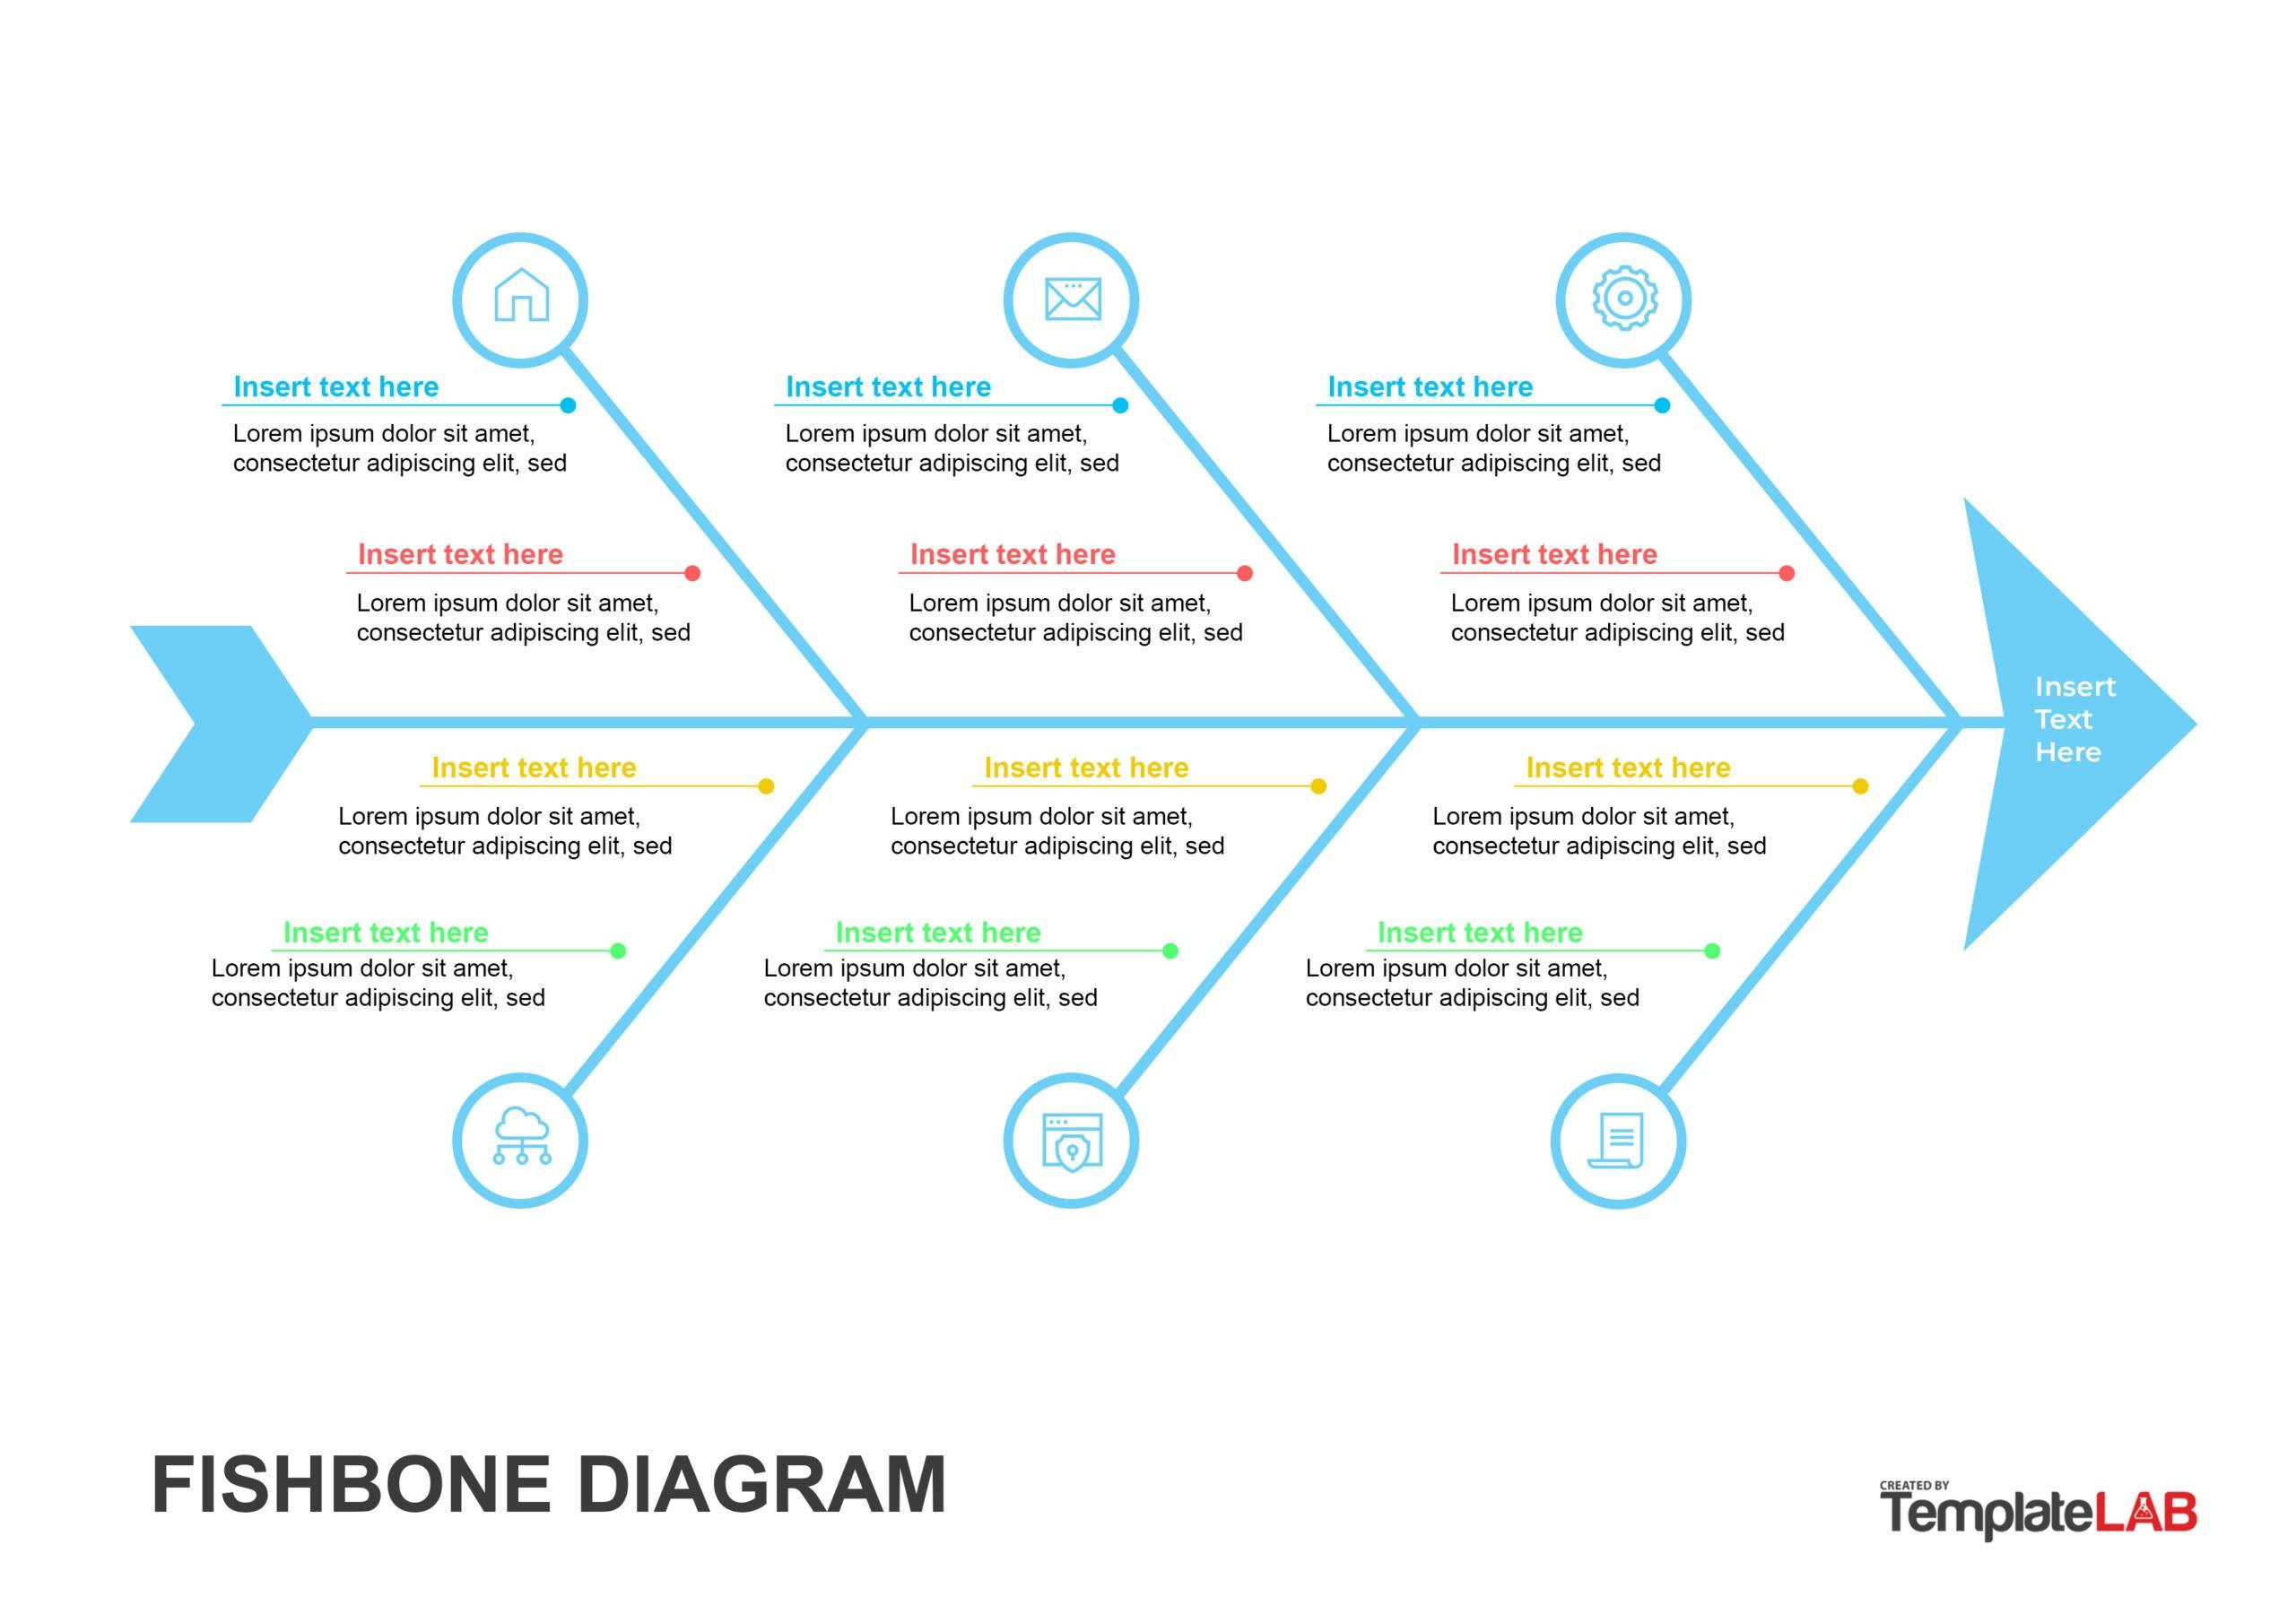 Free Fishbone Diagram Template 13 - TemplateLab.com